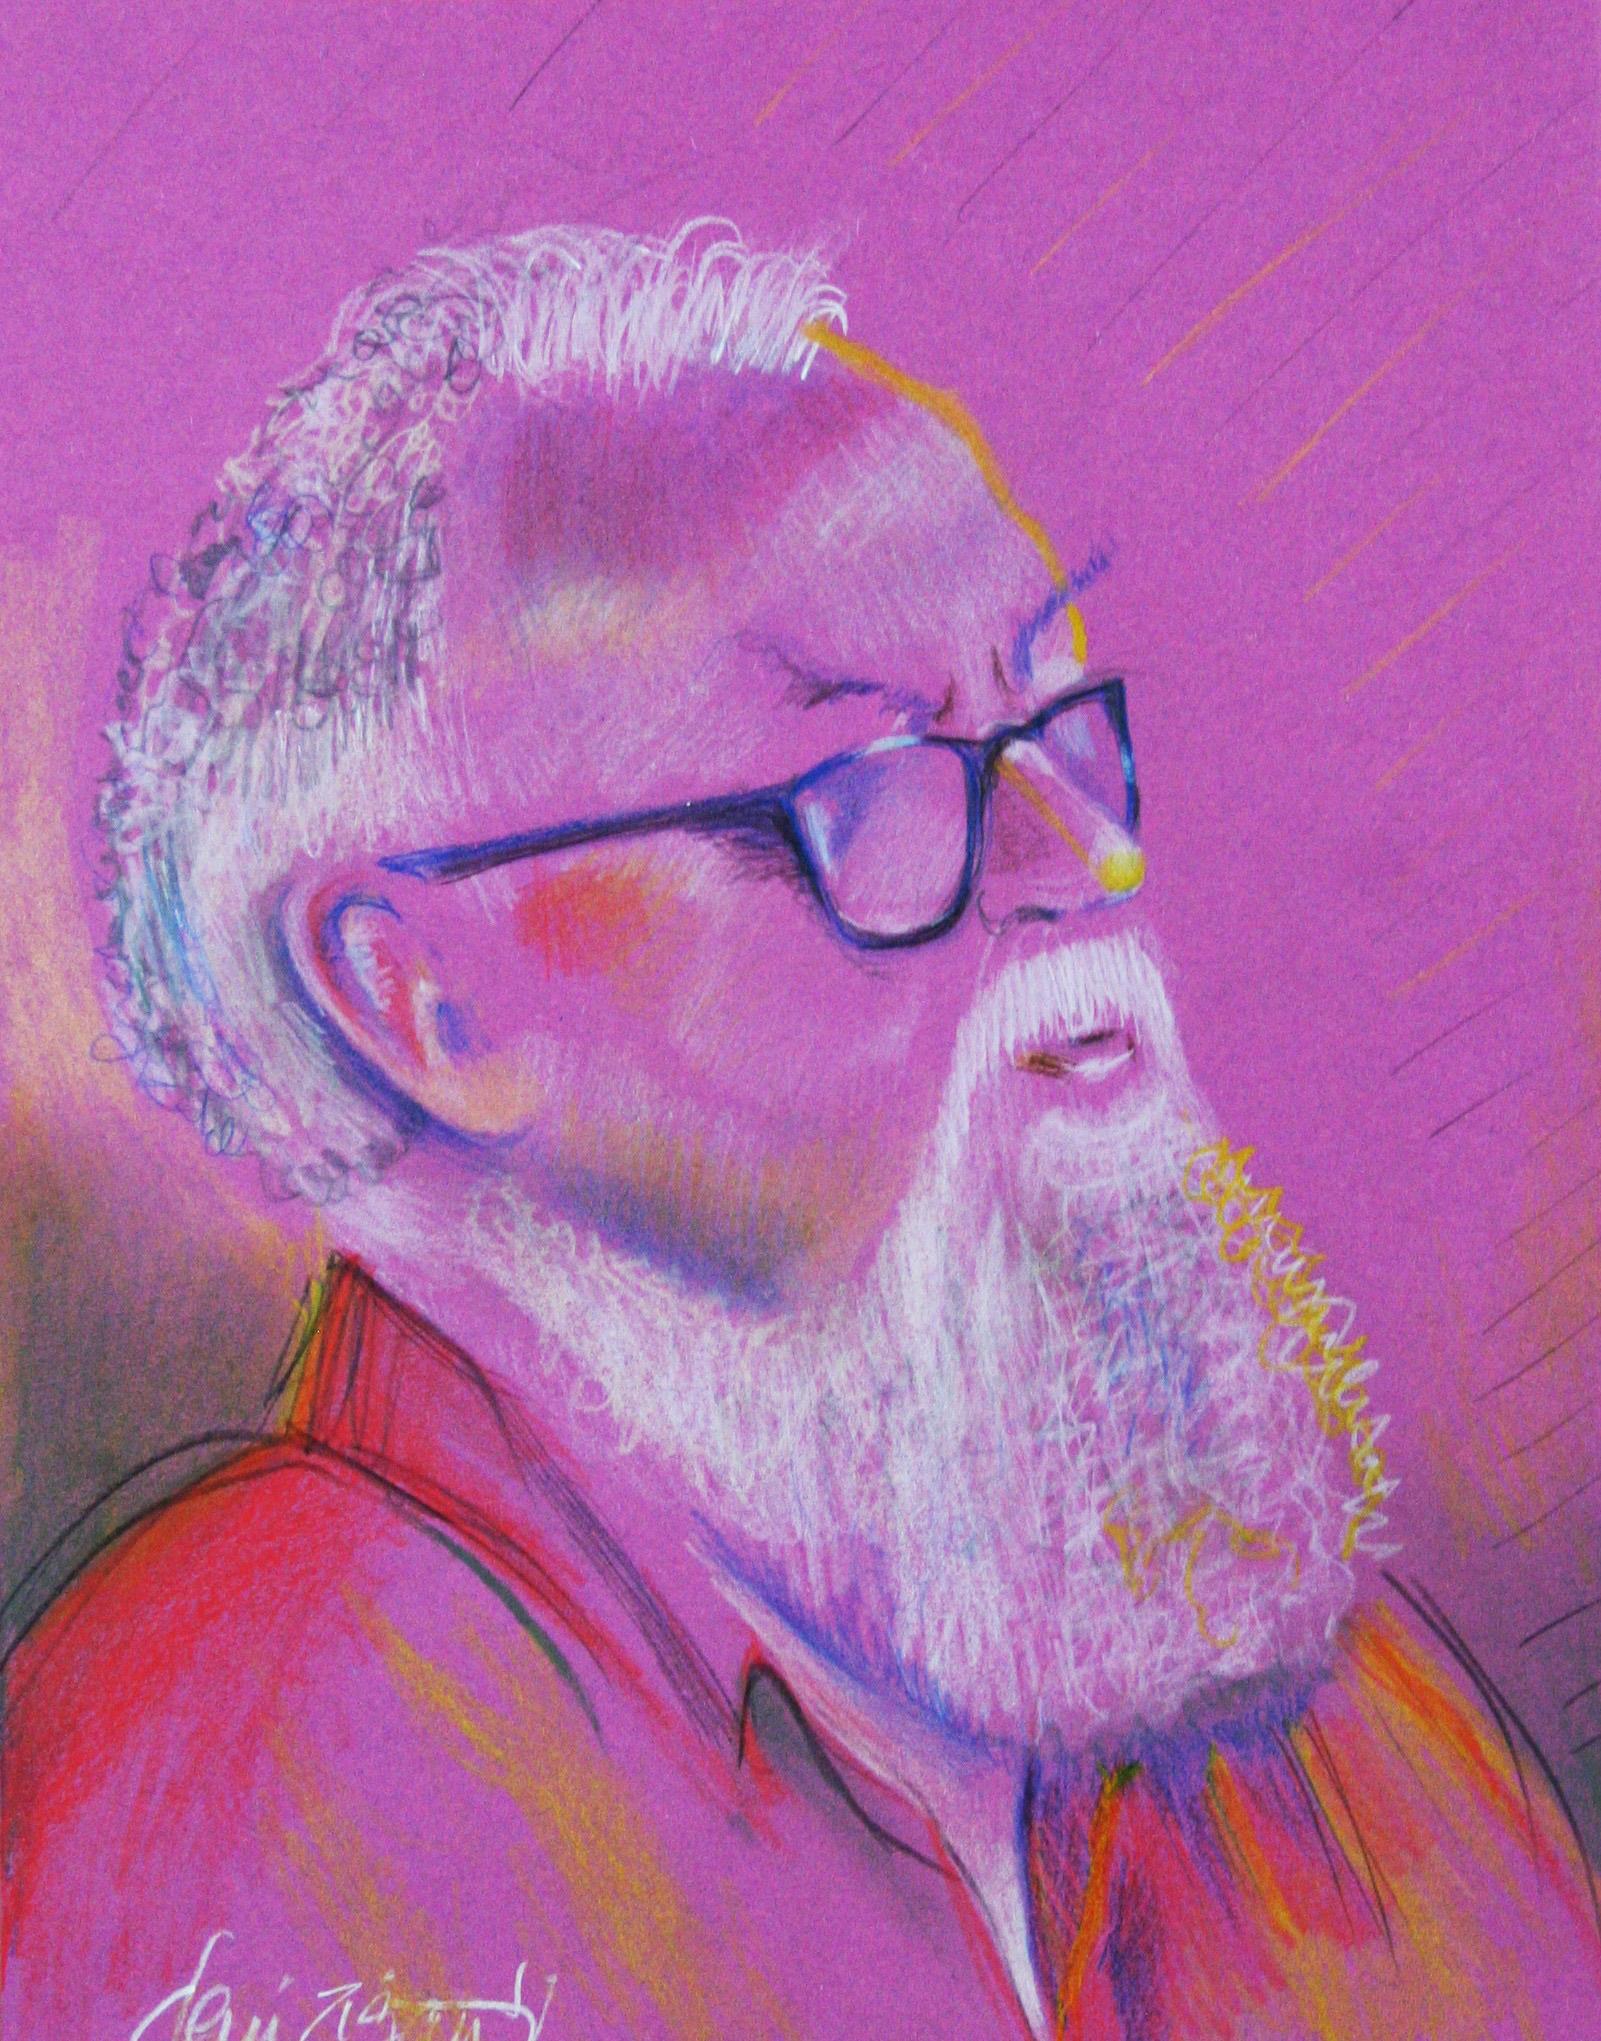 Deni Ziganti did this colored pencil drawing.